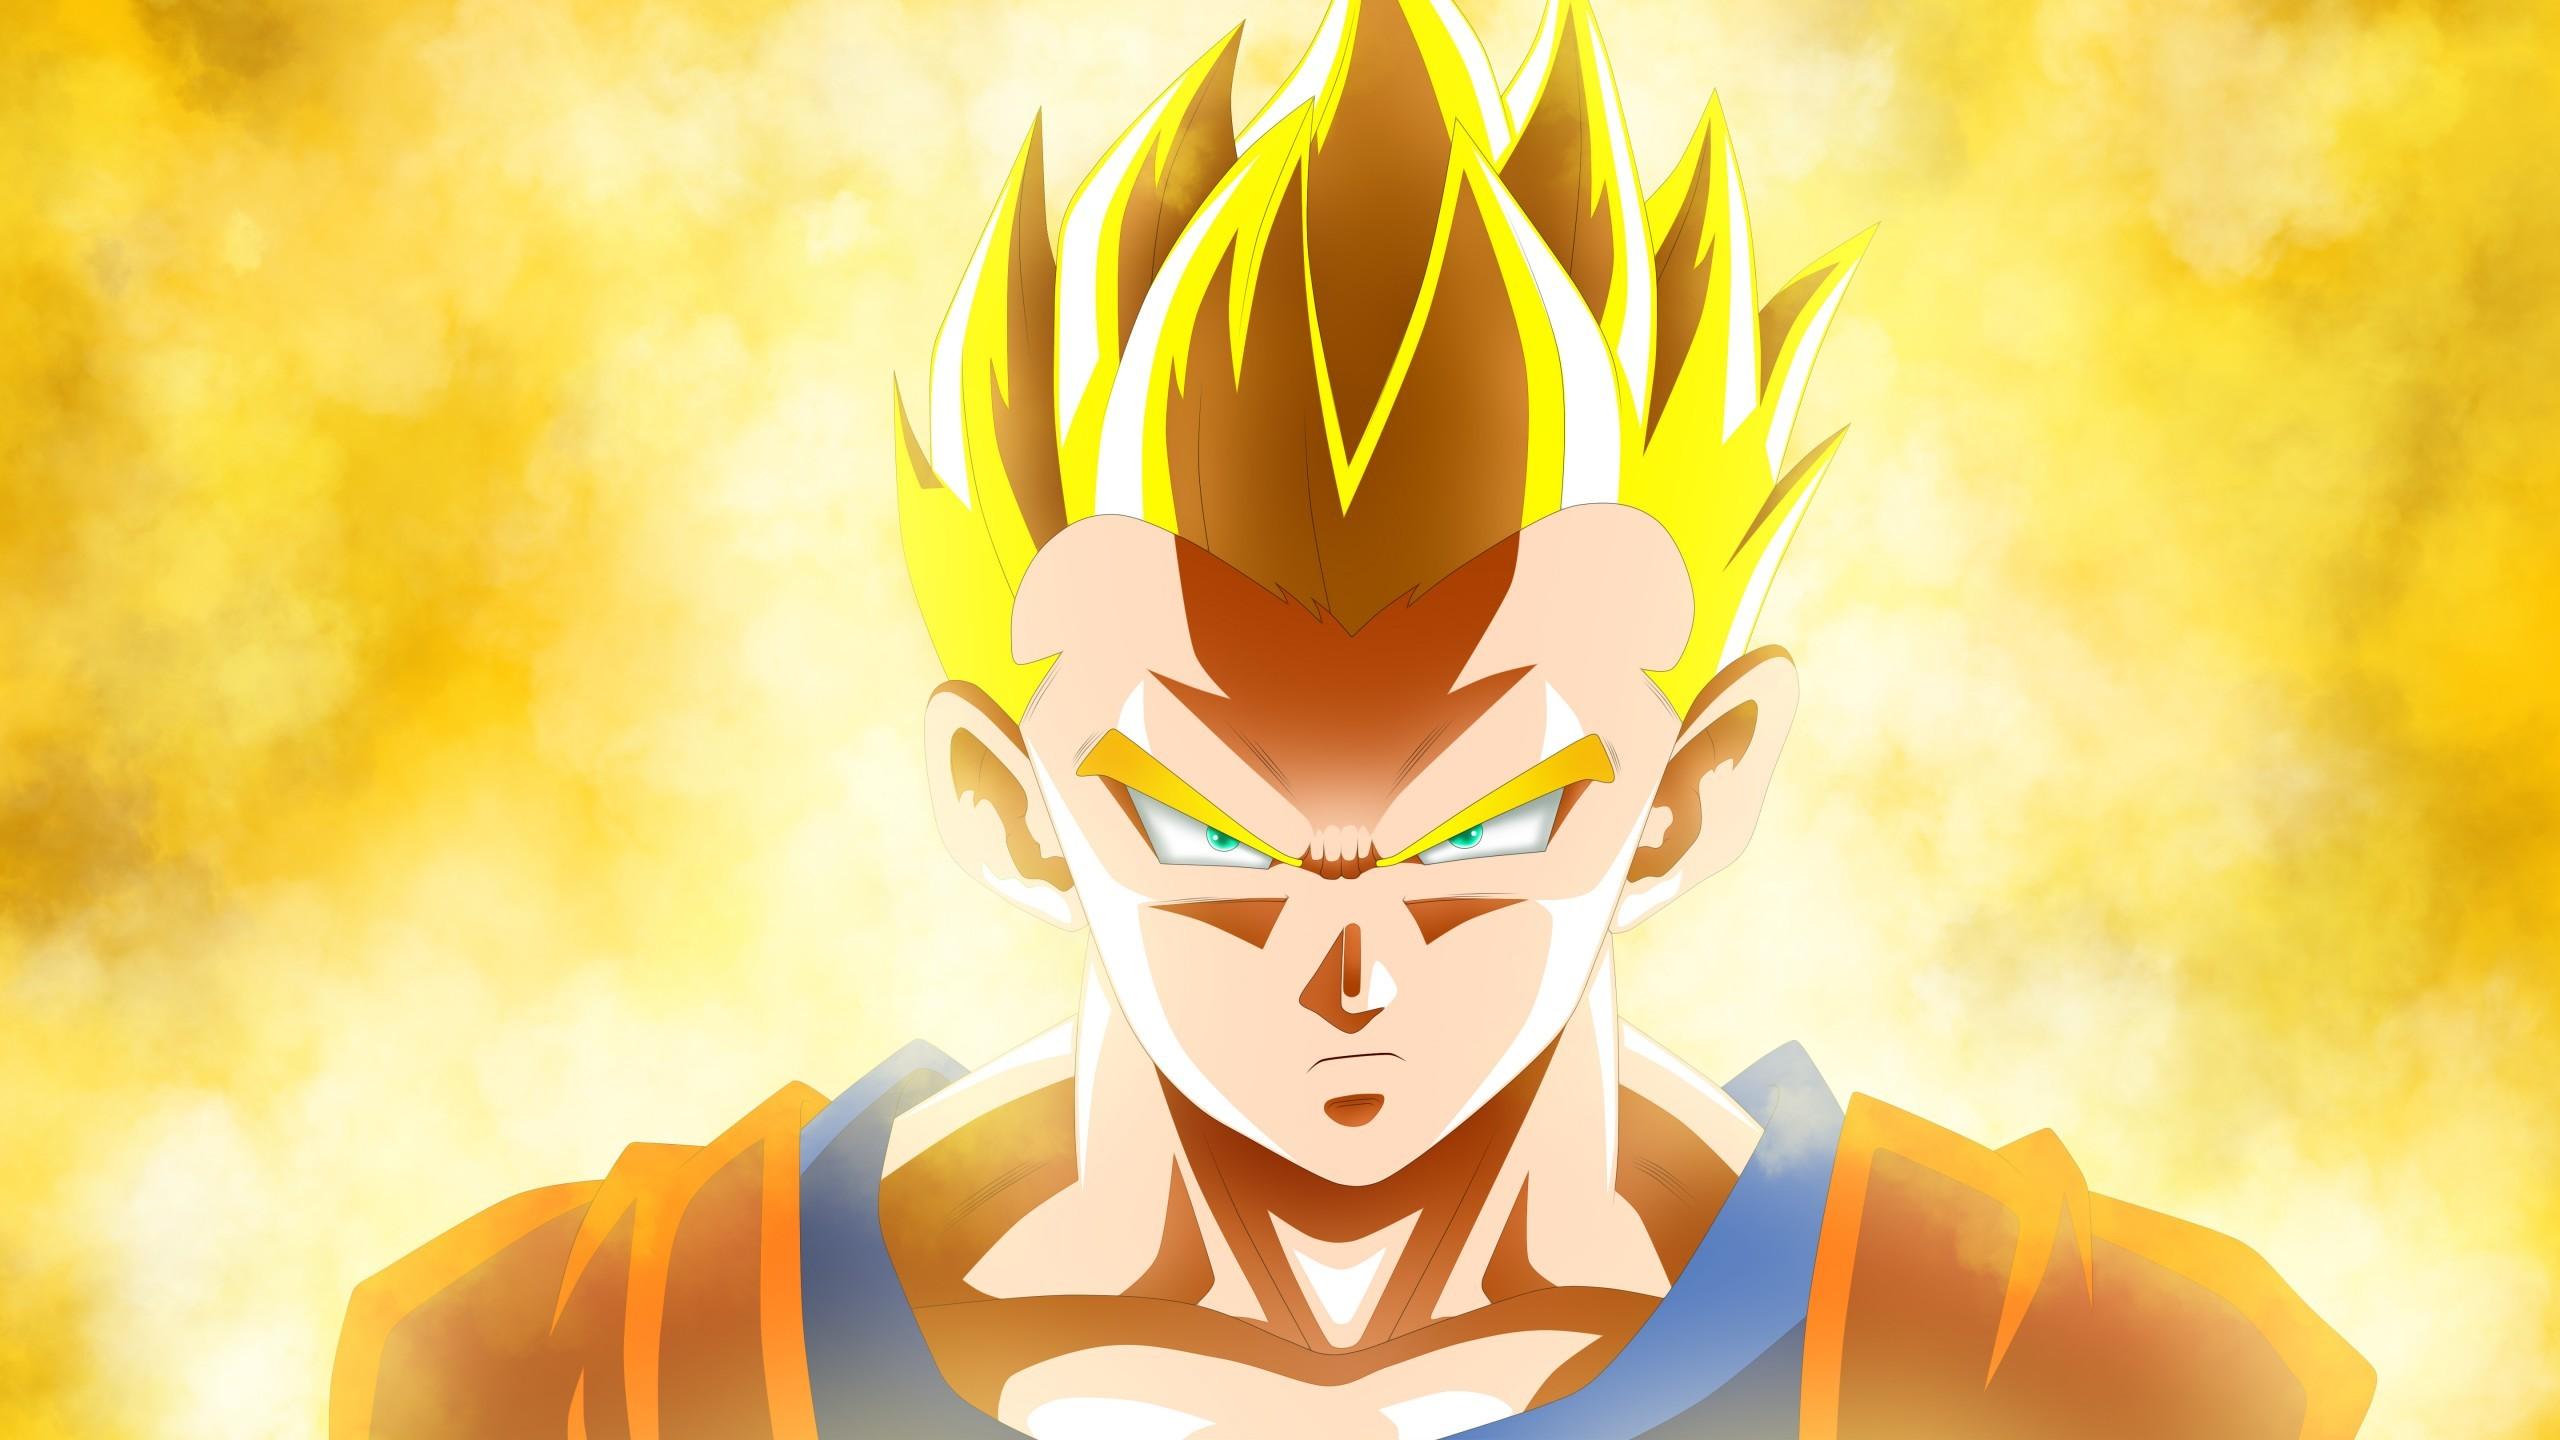 Goku Wallpapers Hd 65 Images